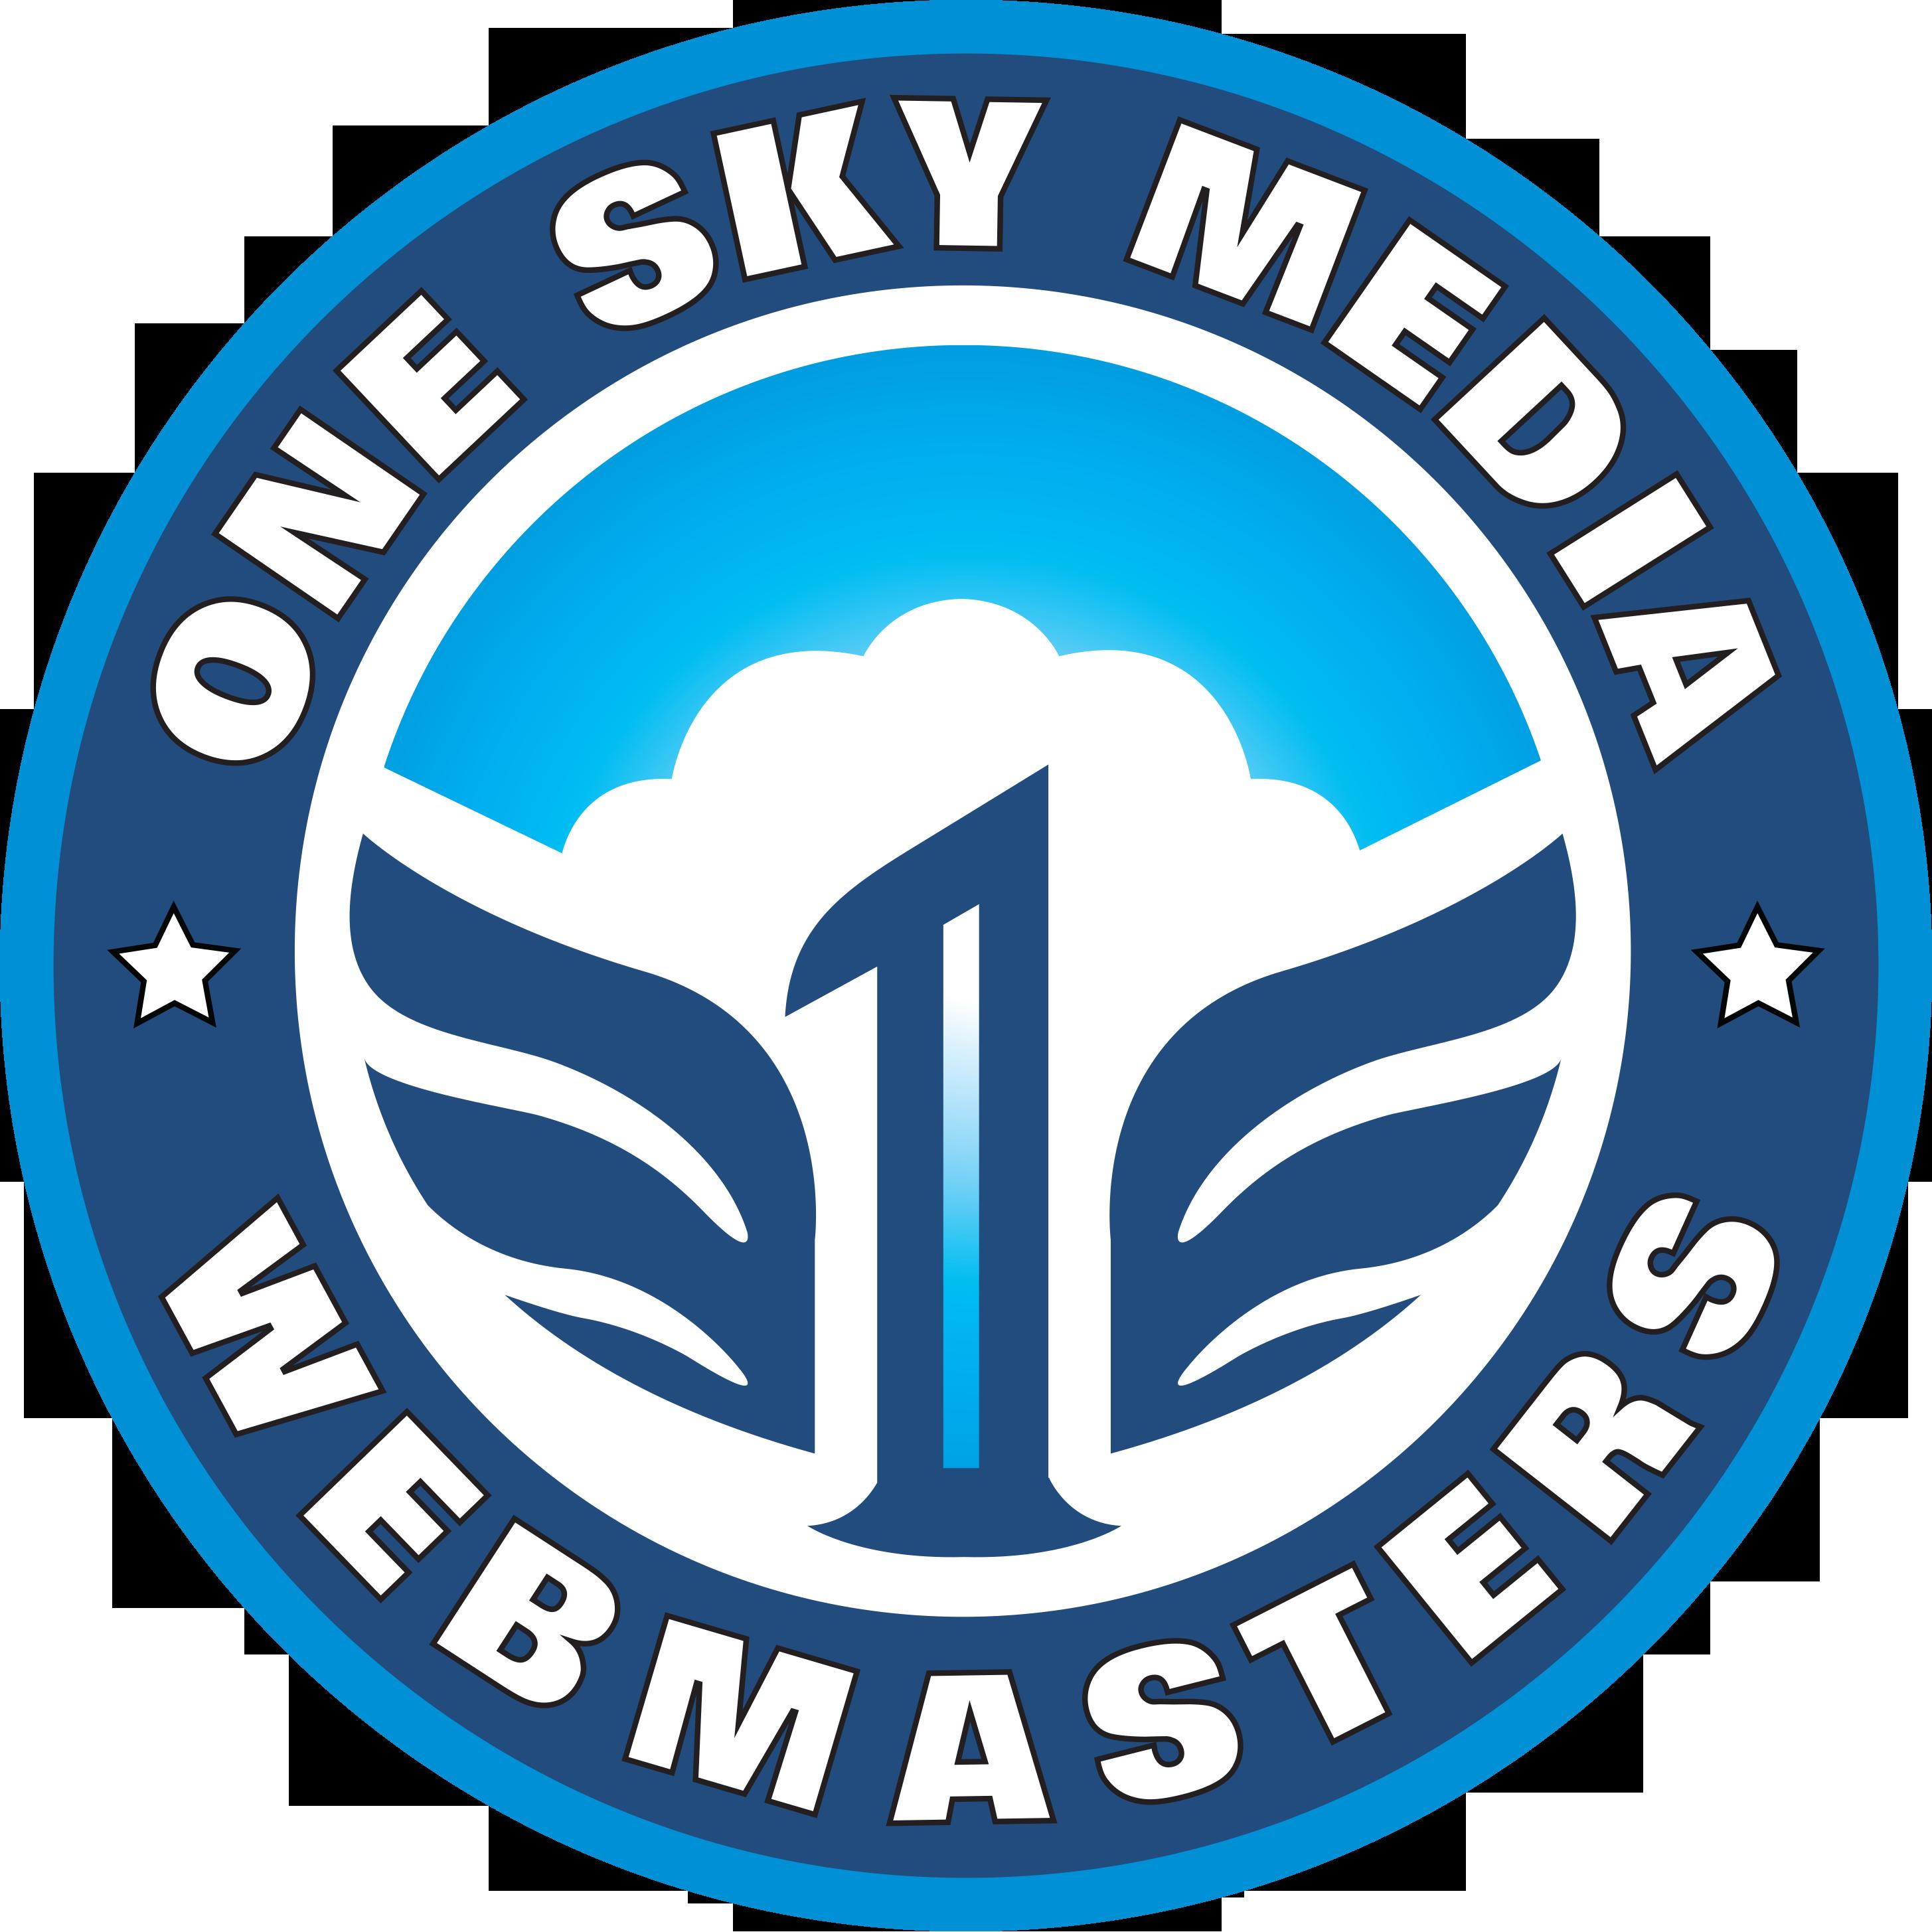 One Sky Media Webmasters